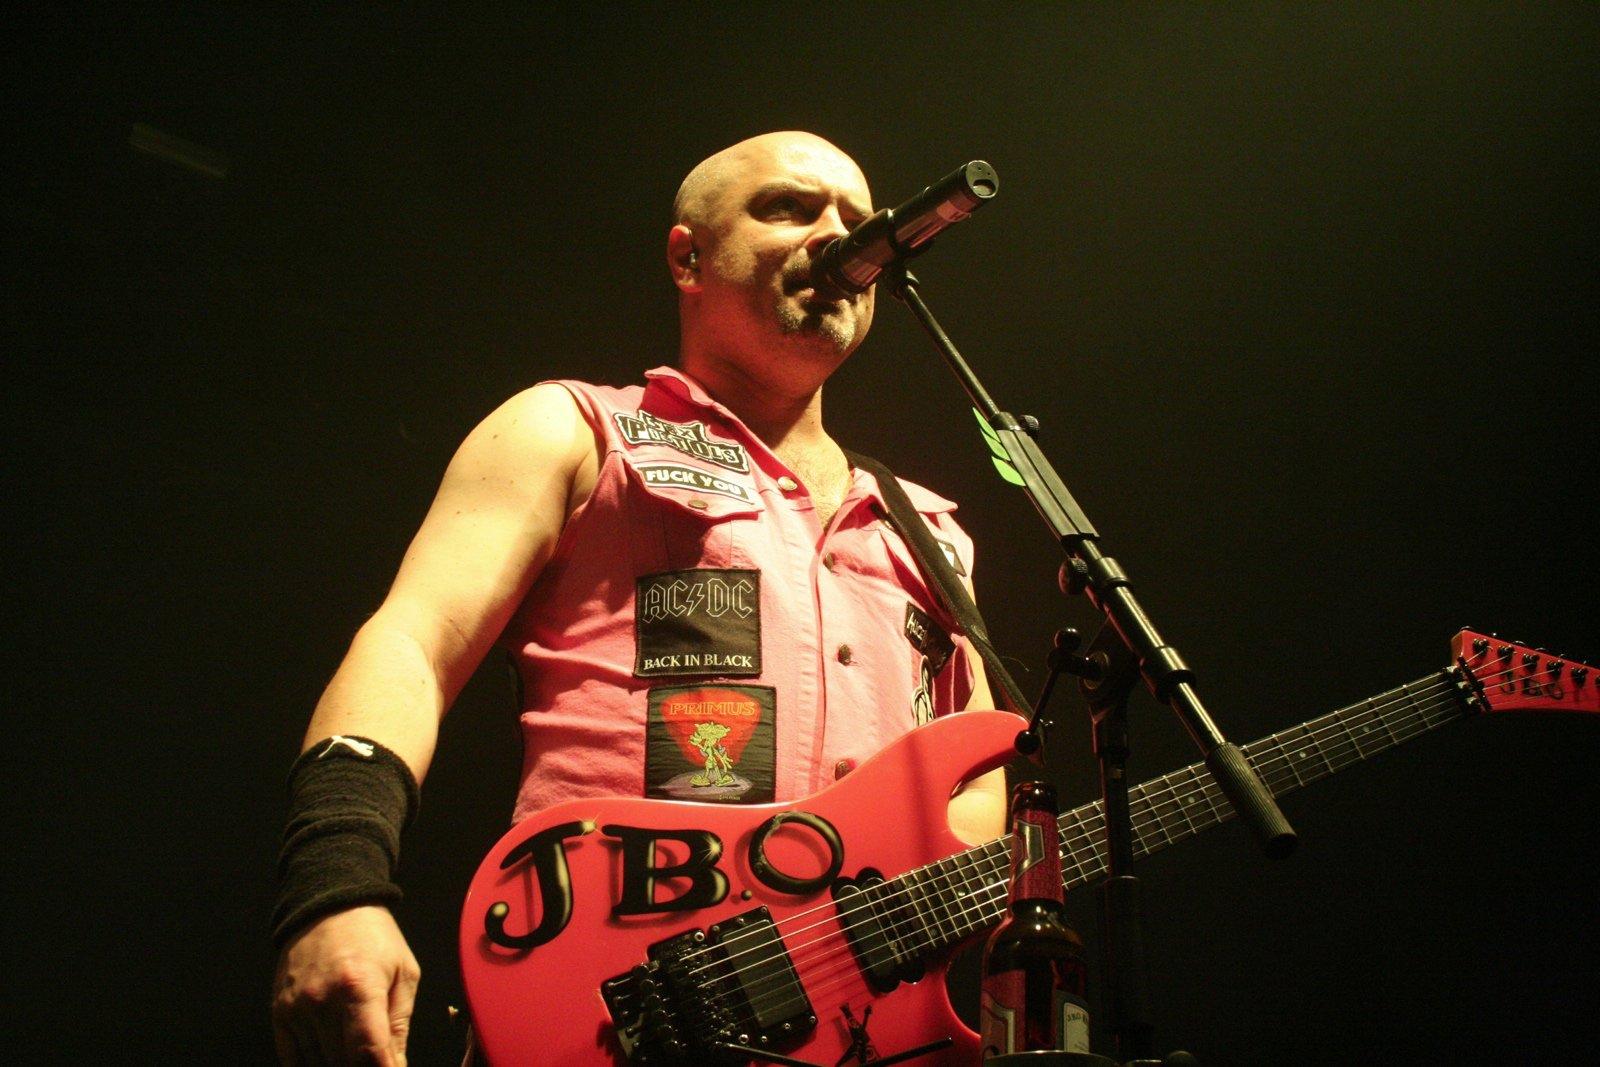 J.B.O. - Illingen - 27.11.2010 - 122